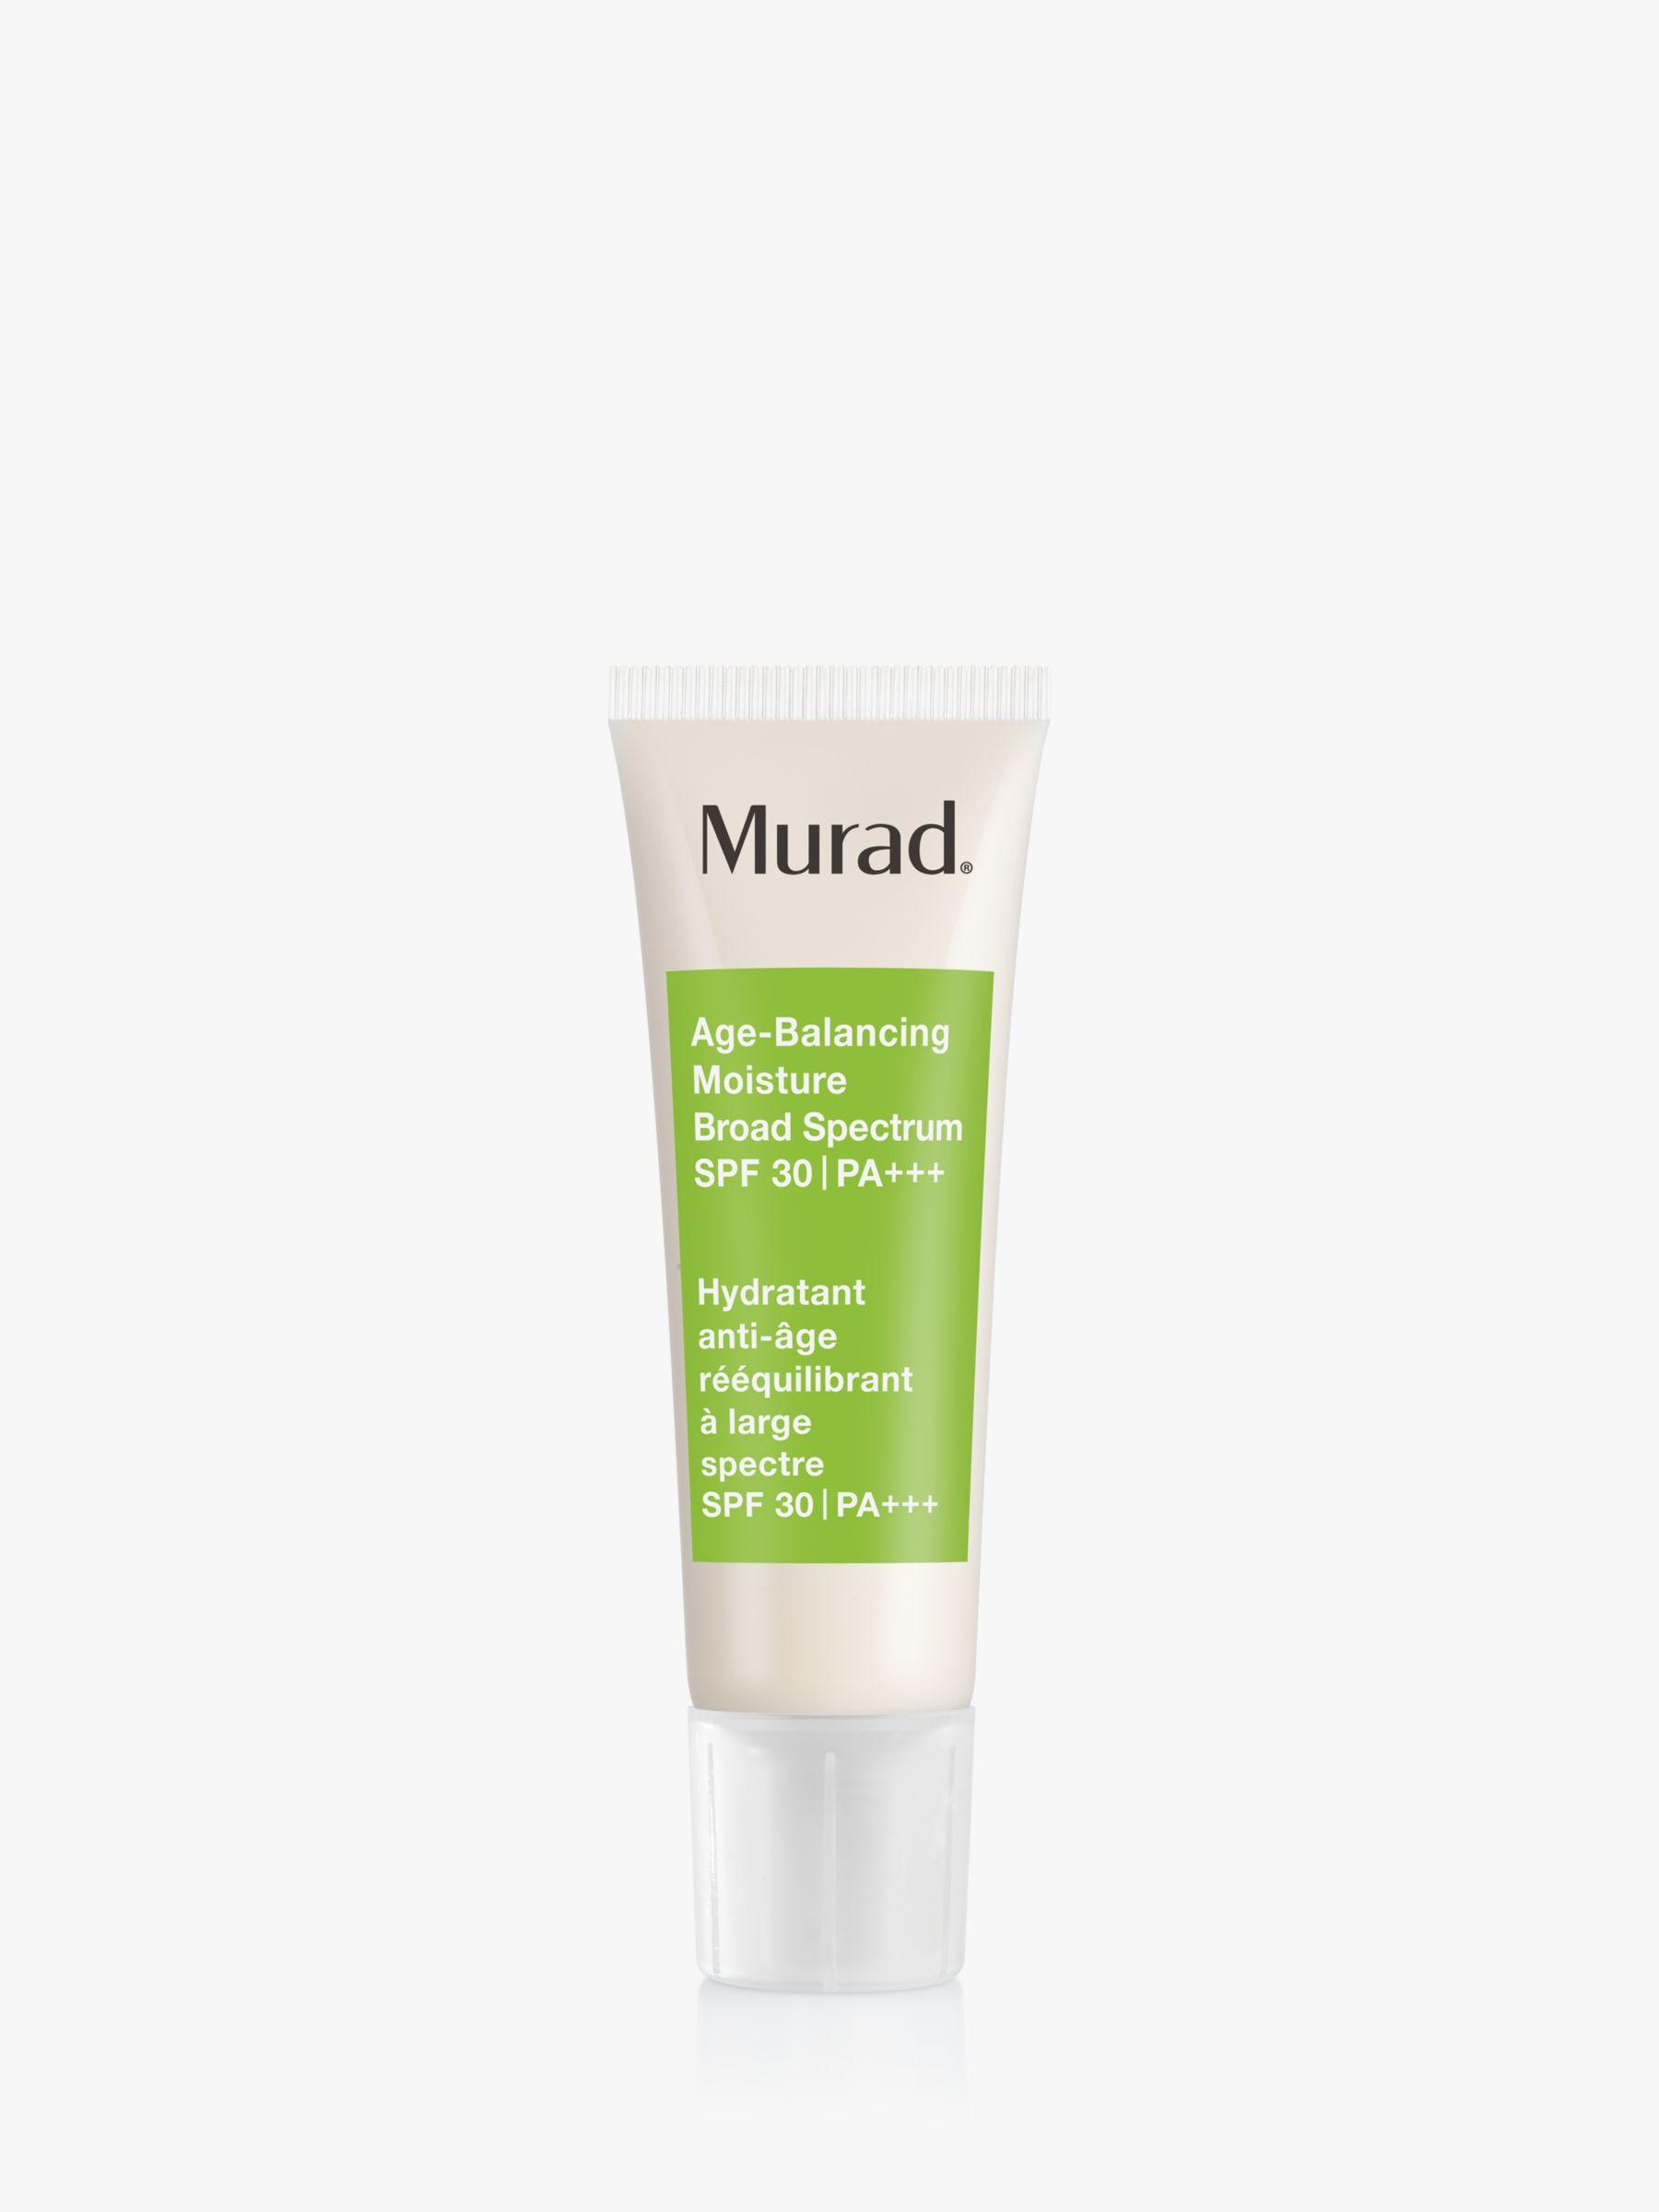 Murad Murad Age-Balancing Moisture SPF 30, 50ml